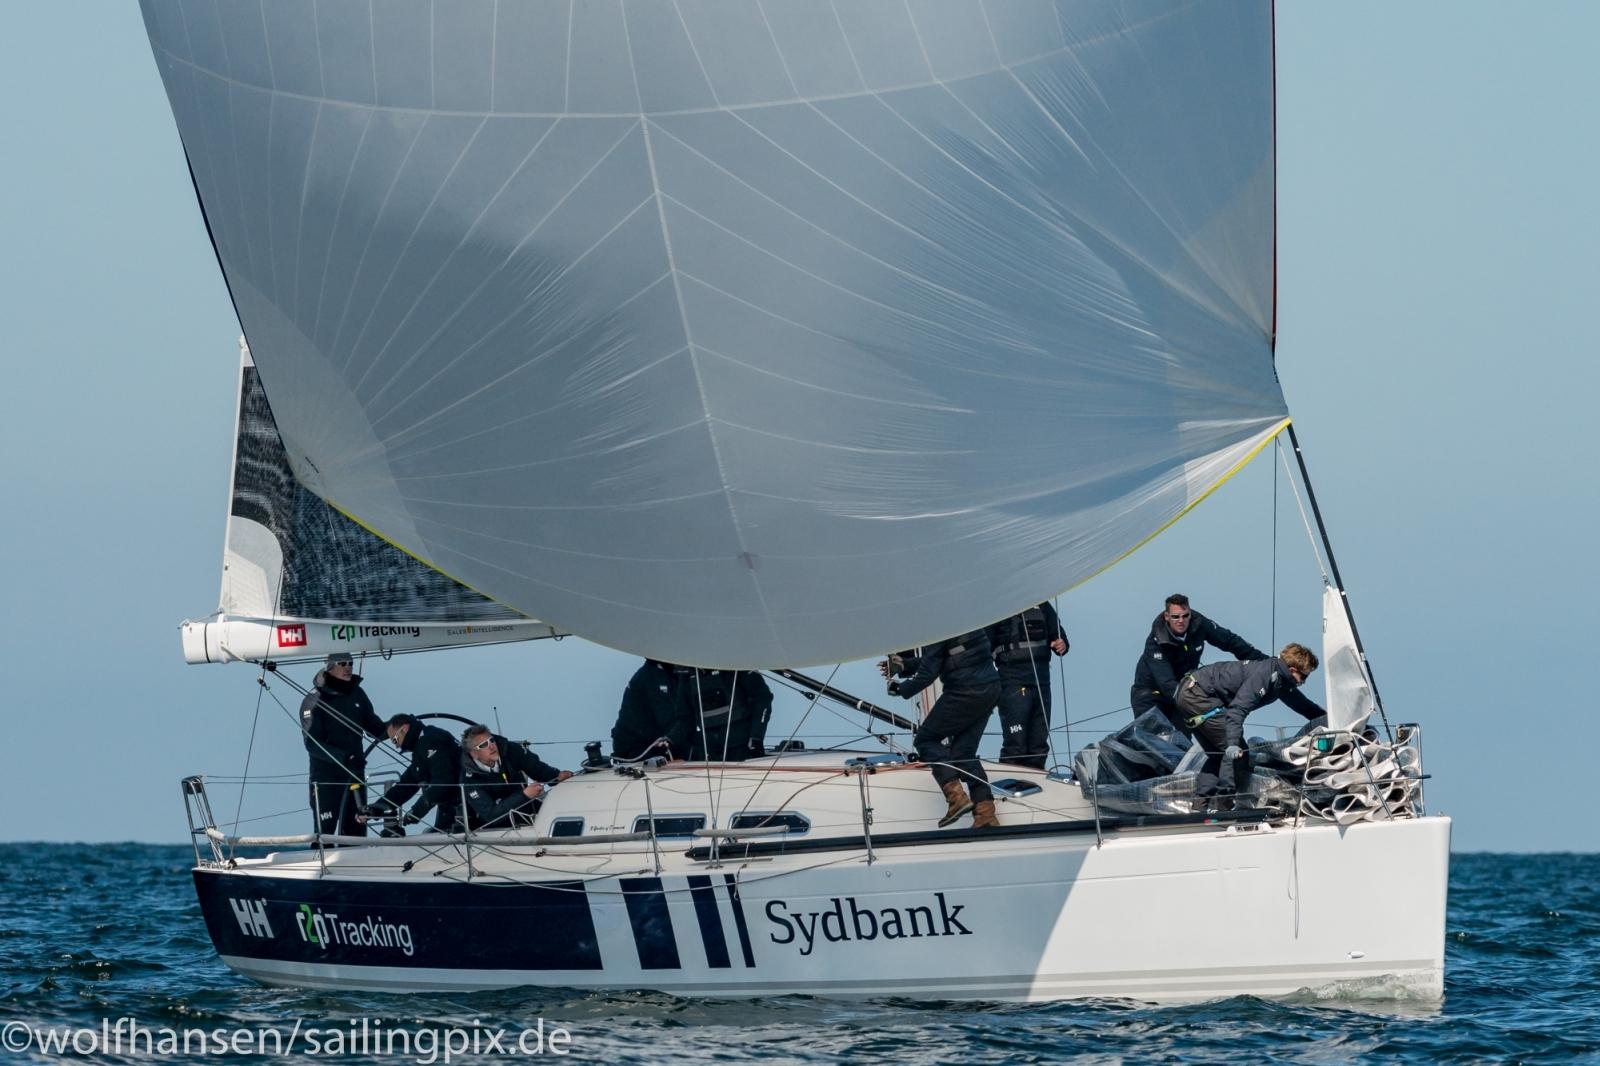 Yacht Sydbank